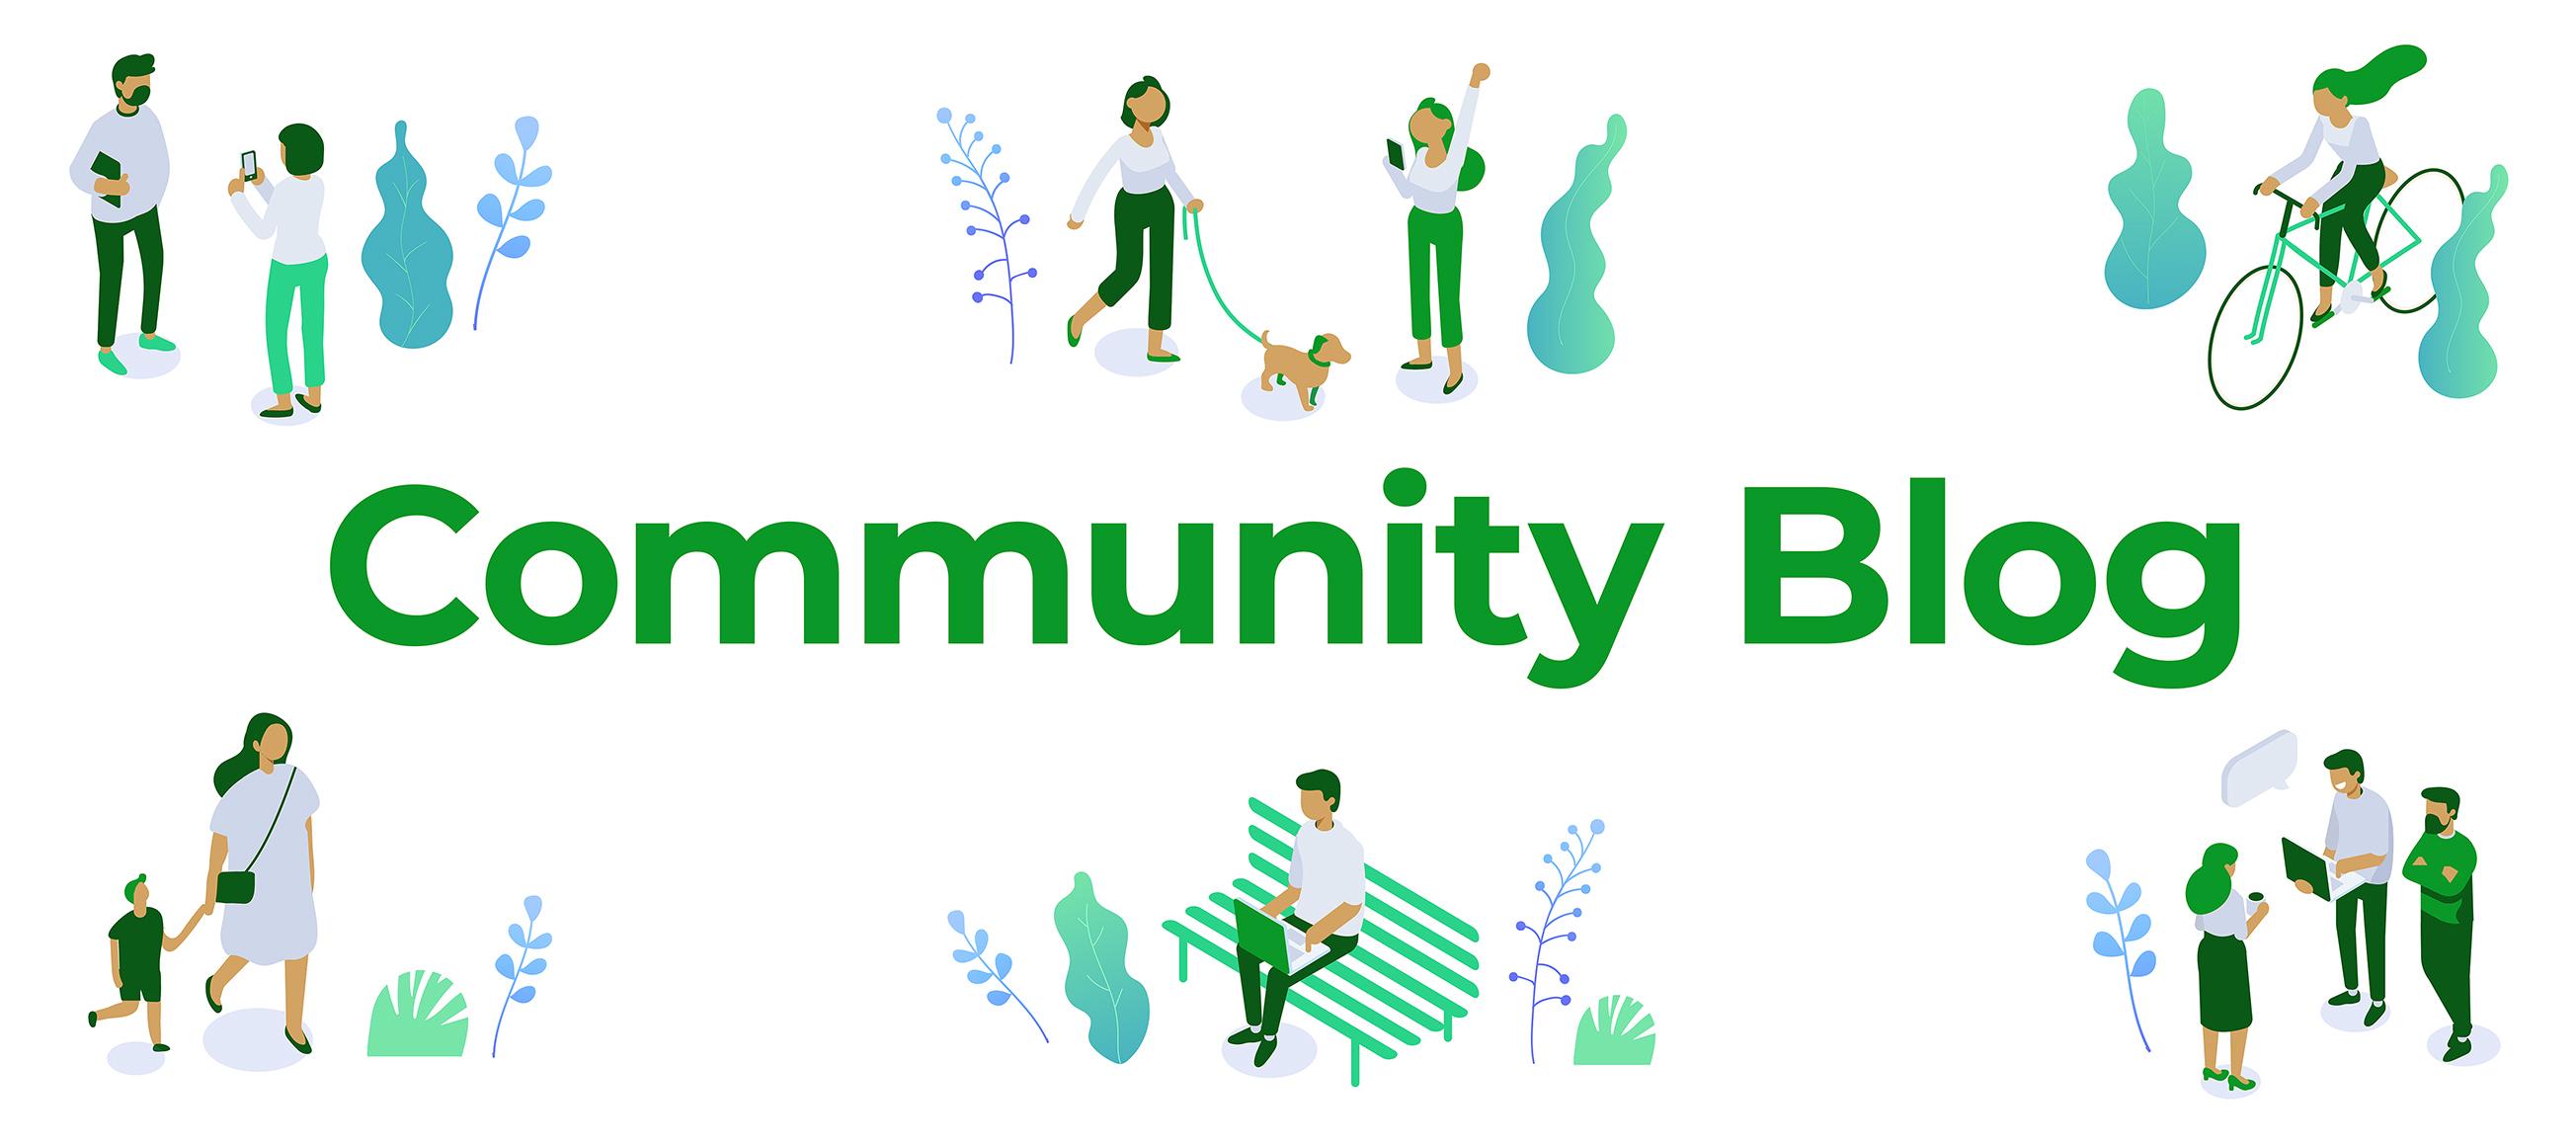 OVO Community Blog - Issue 17